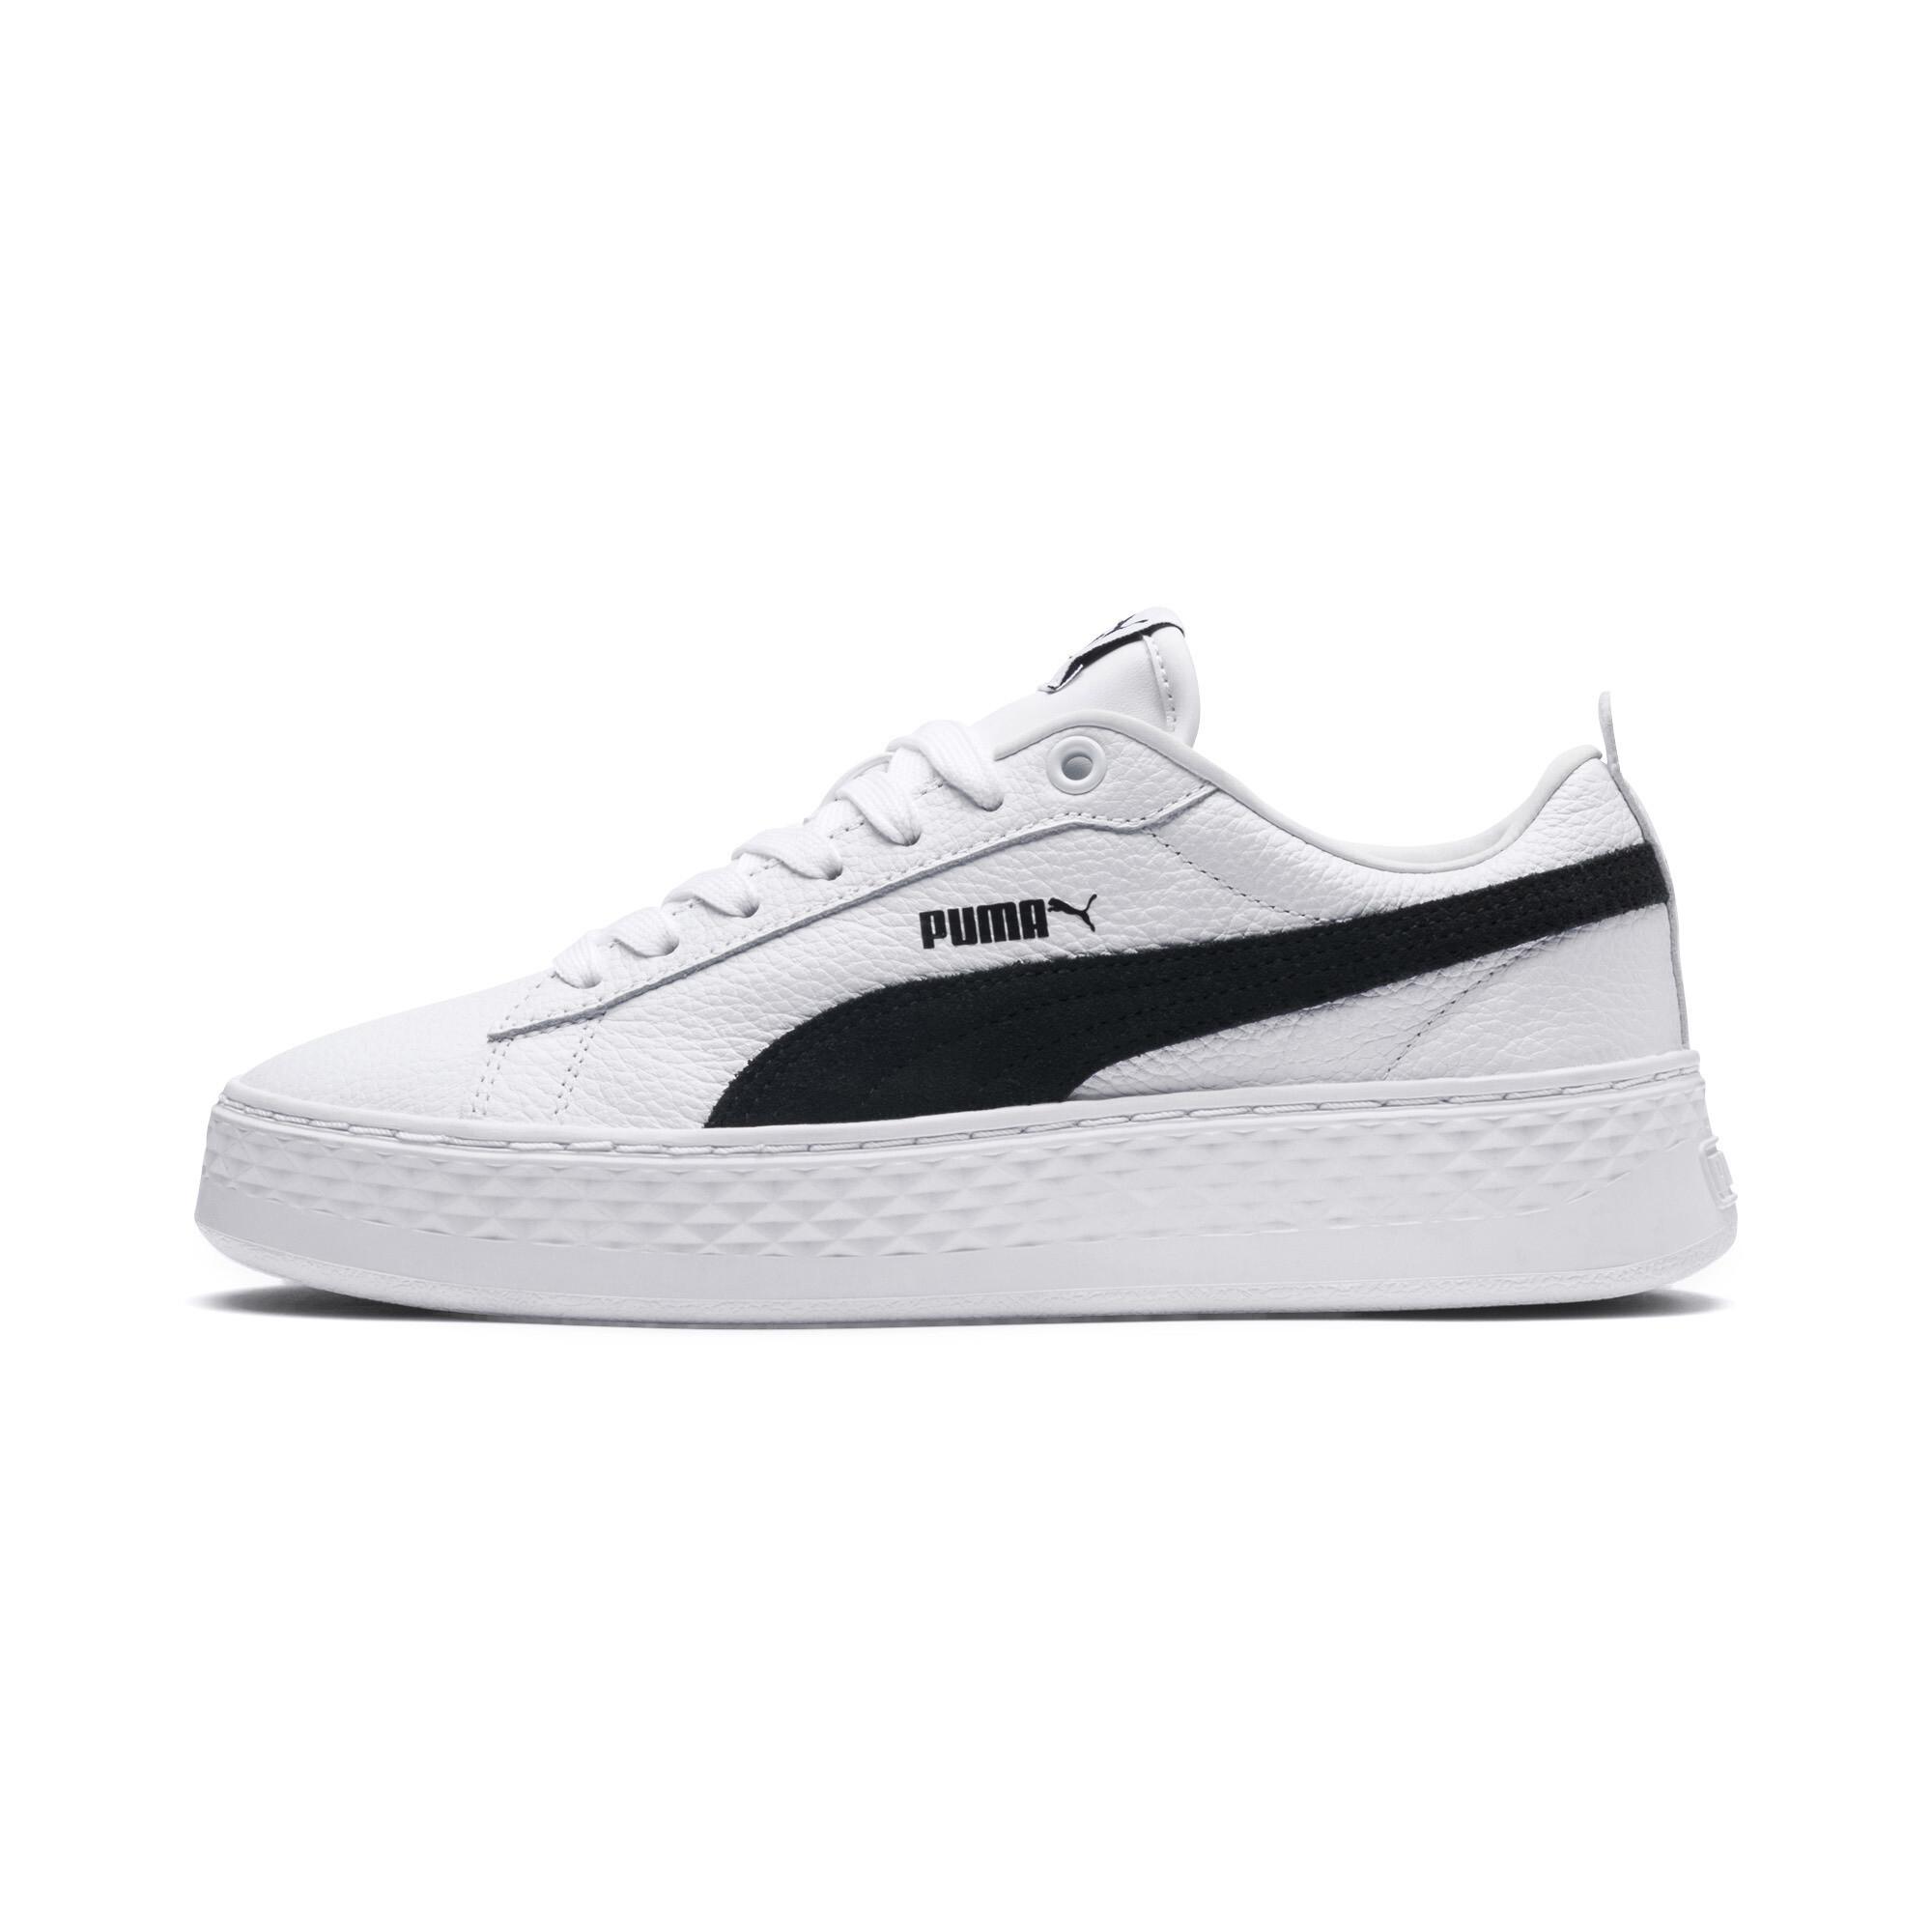 PUMA-Smash-Platform-Leather-Women-039-s-Sneakers-Women-Shoe-Basics thumbnail 14